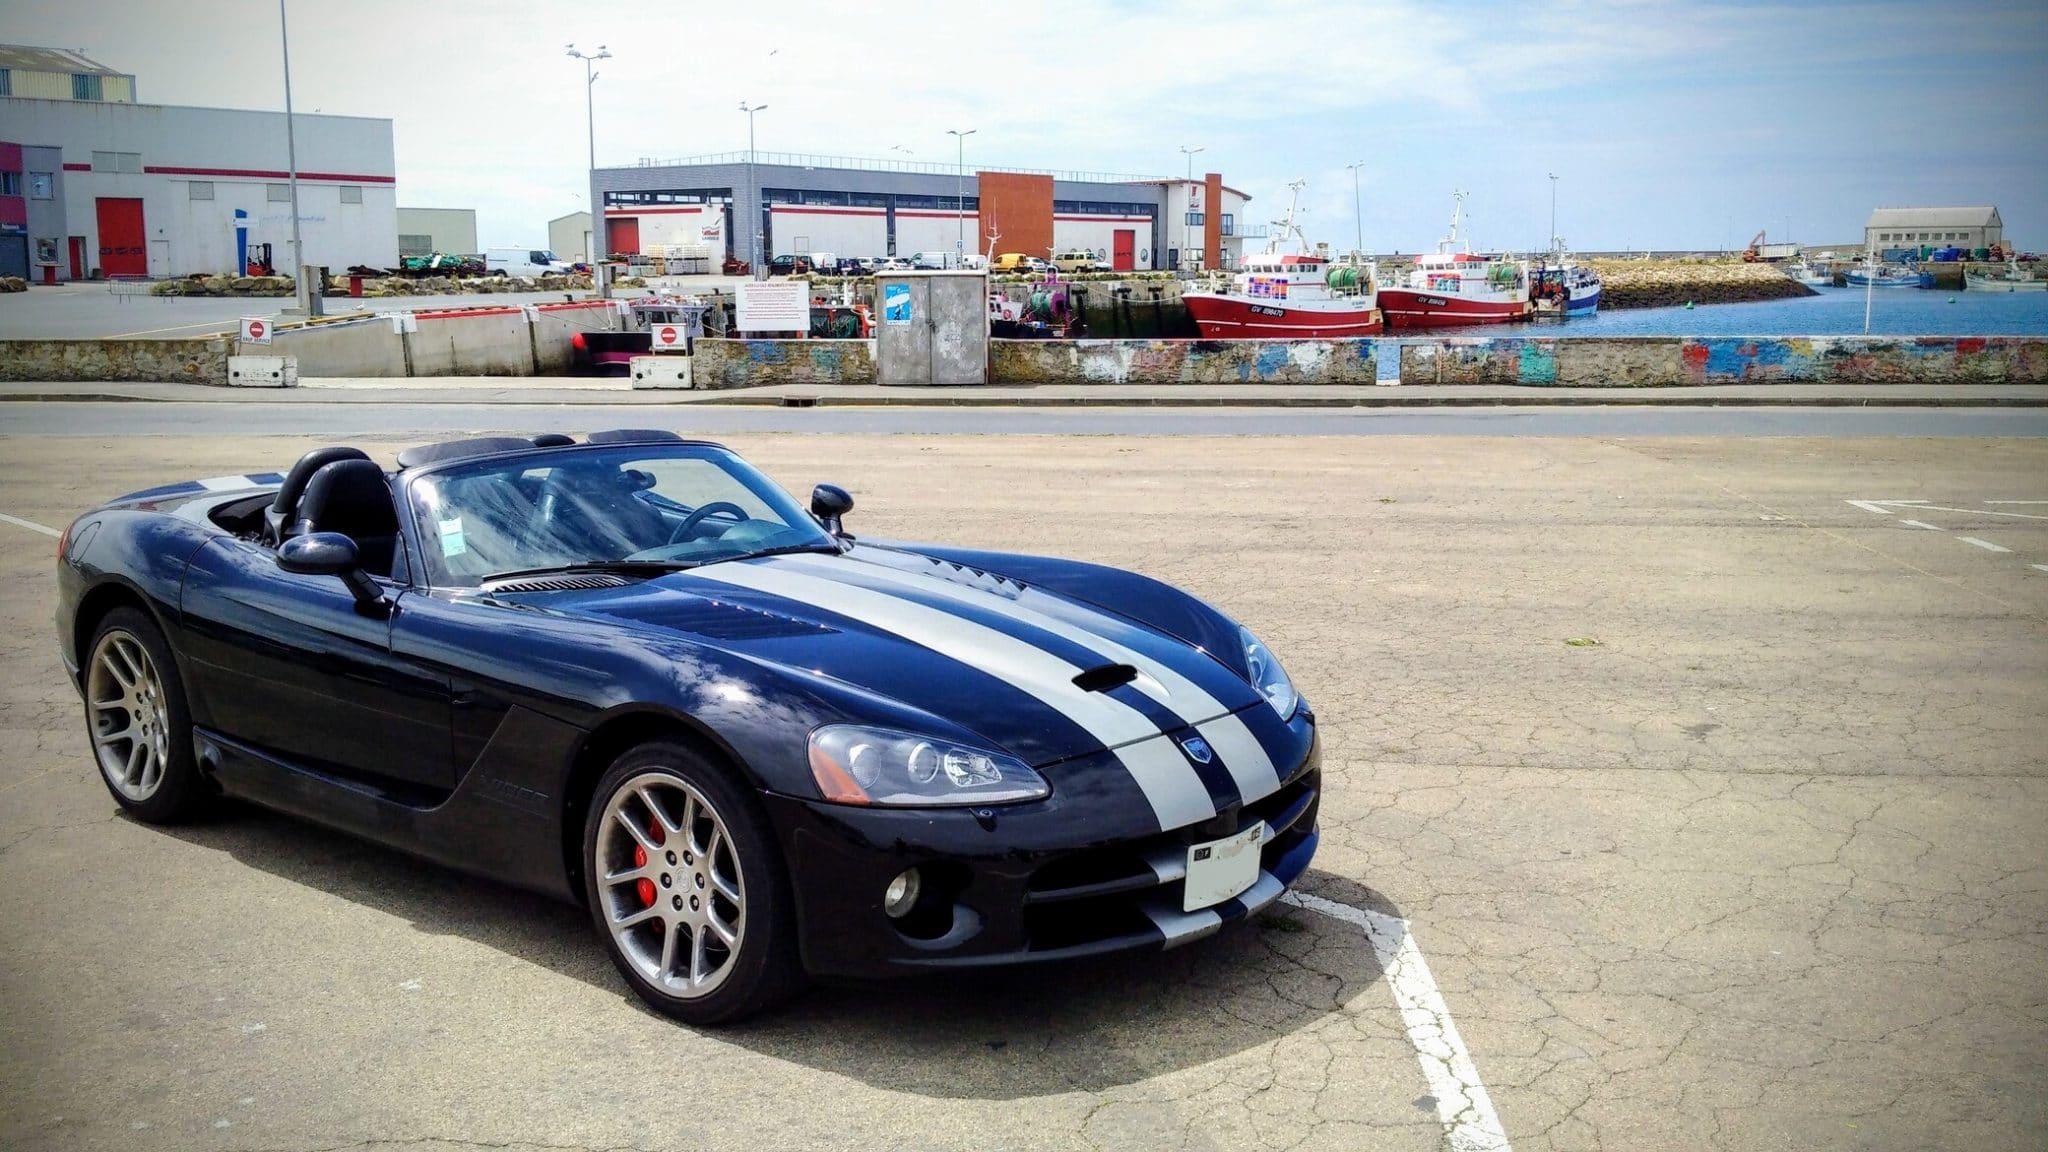 Avis des Propriétaires : Dodge Viper SRT10 (2003) de Benjamin